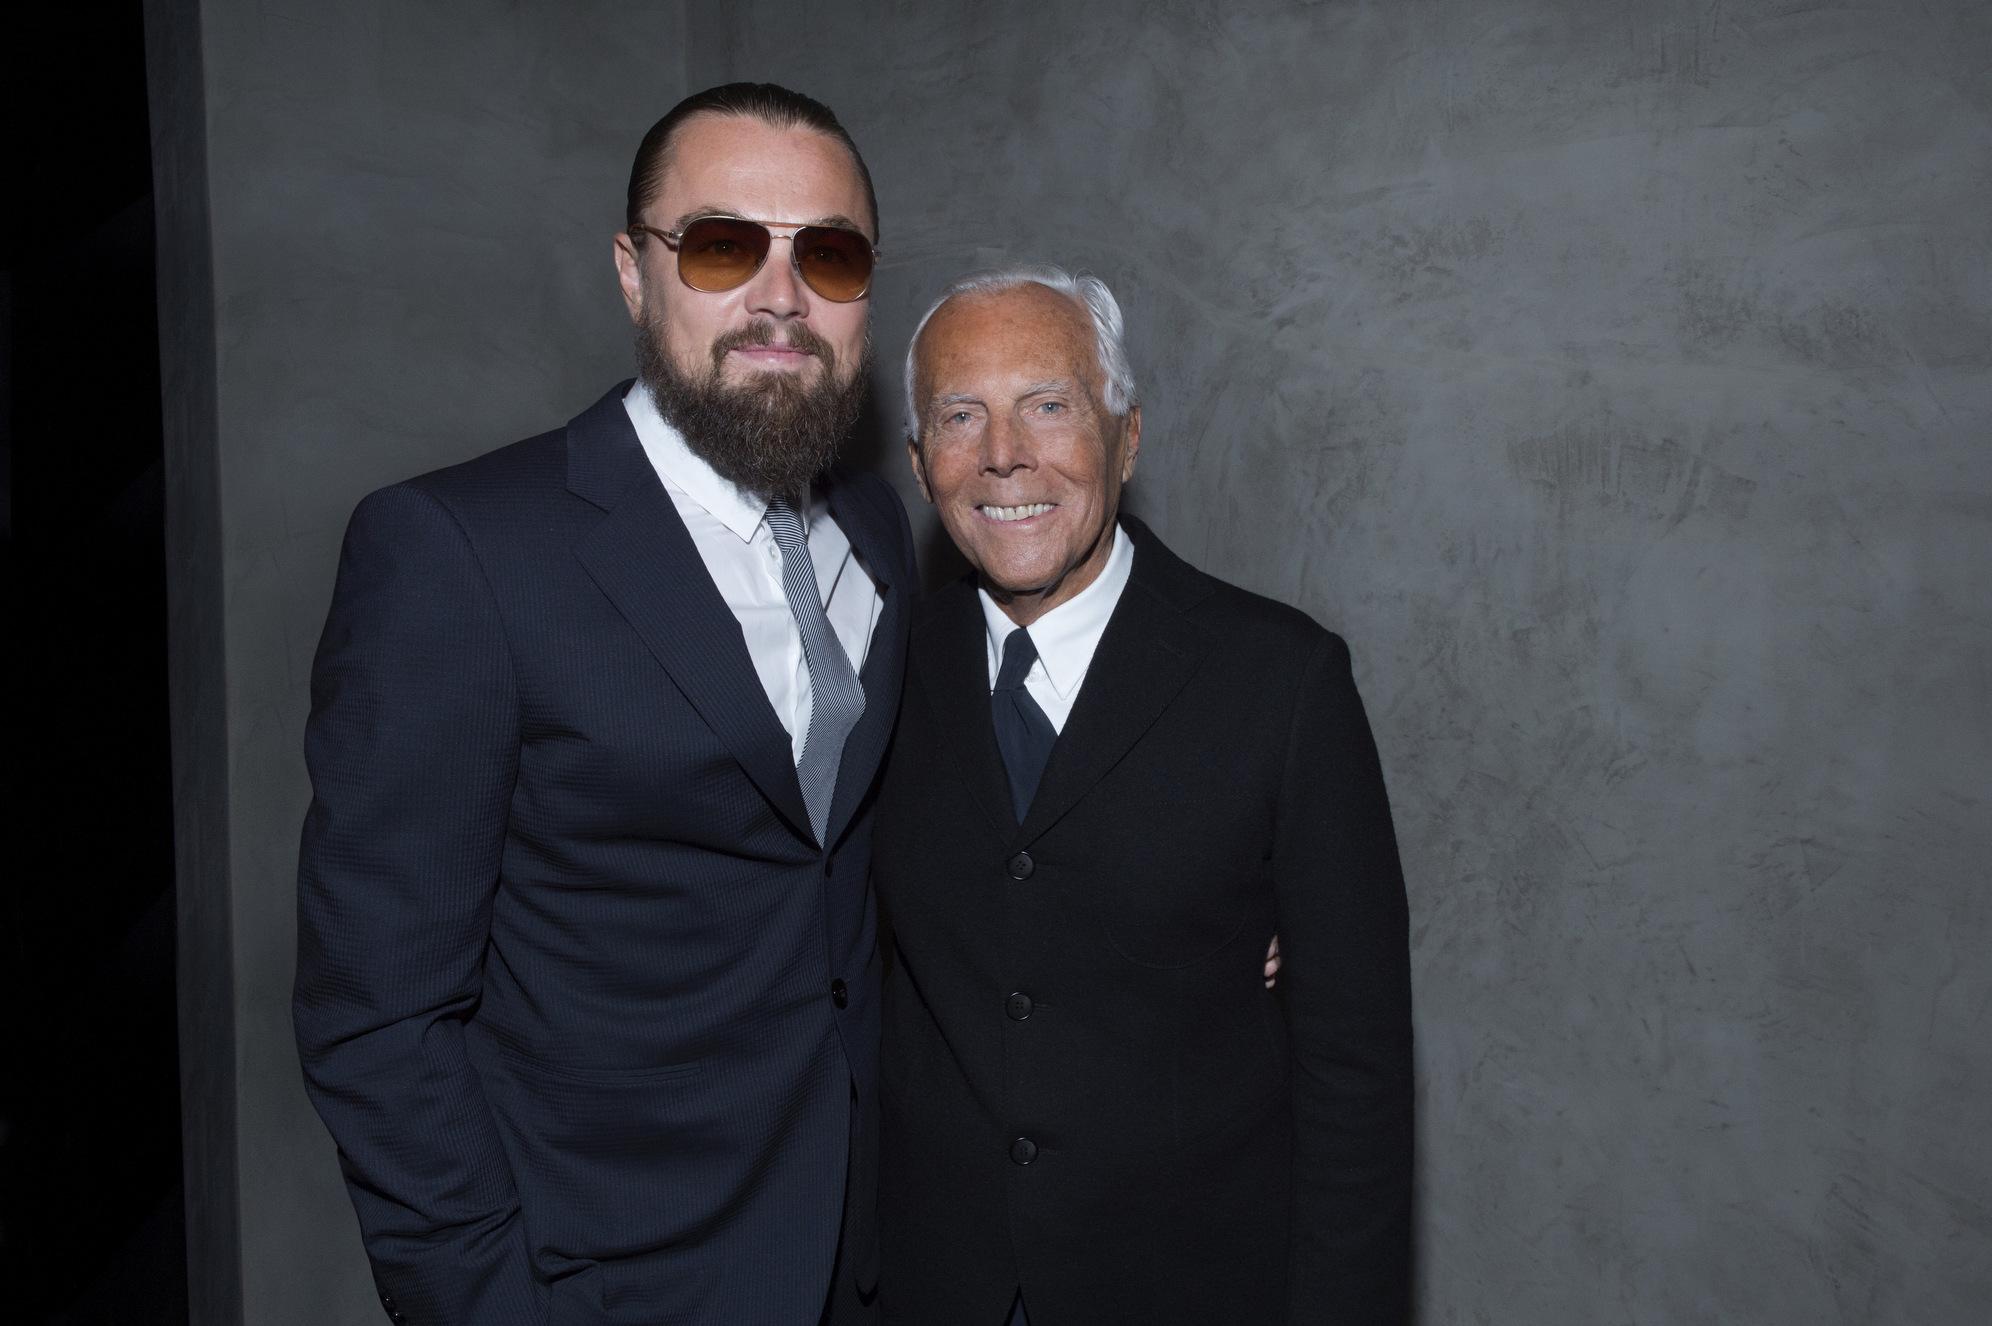 Leonardo DiCaprio, Chris Pine + More Attend Giorgio Armani 40th Anniversary Show